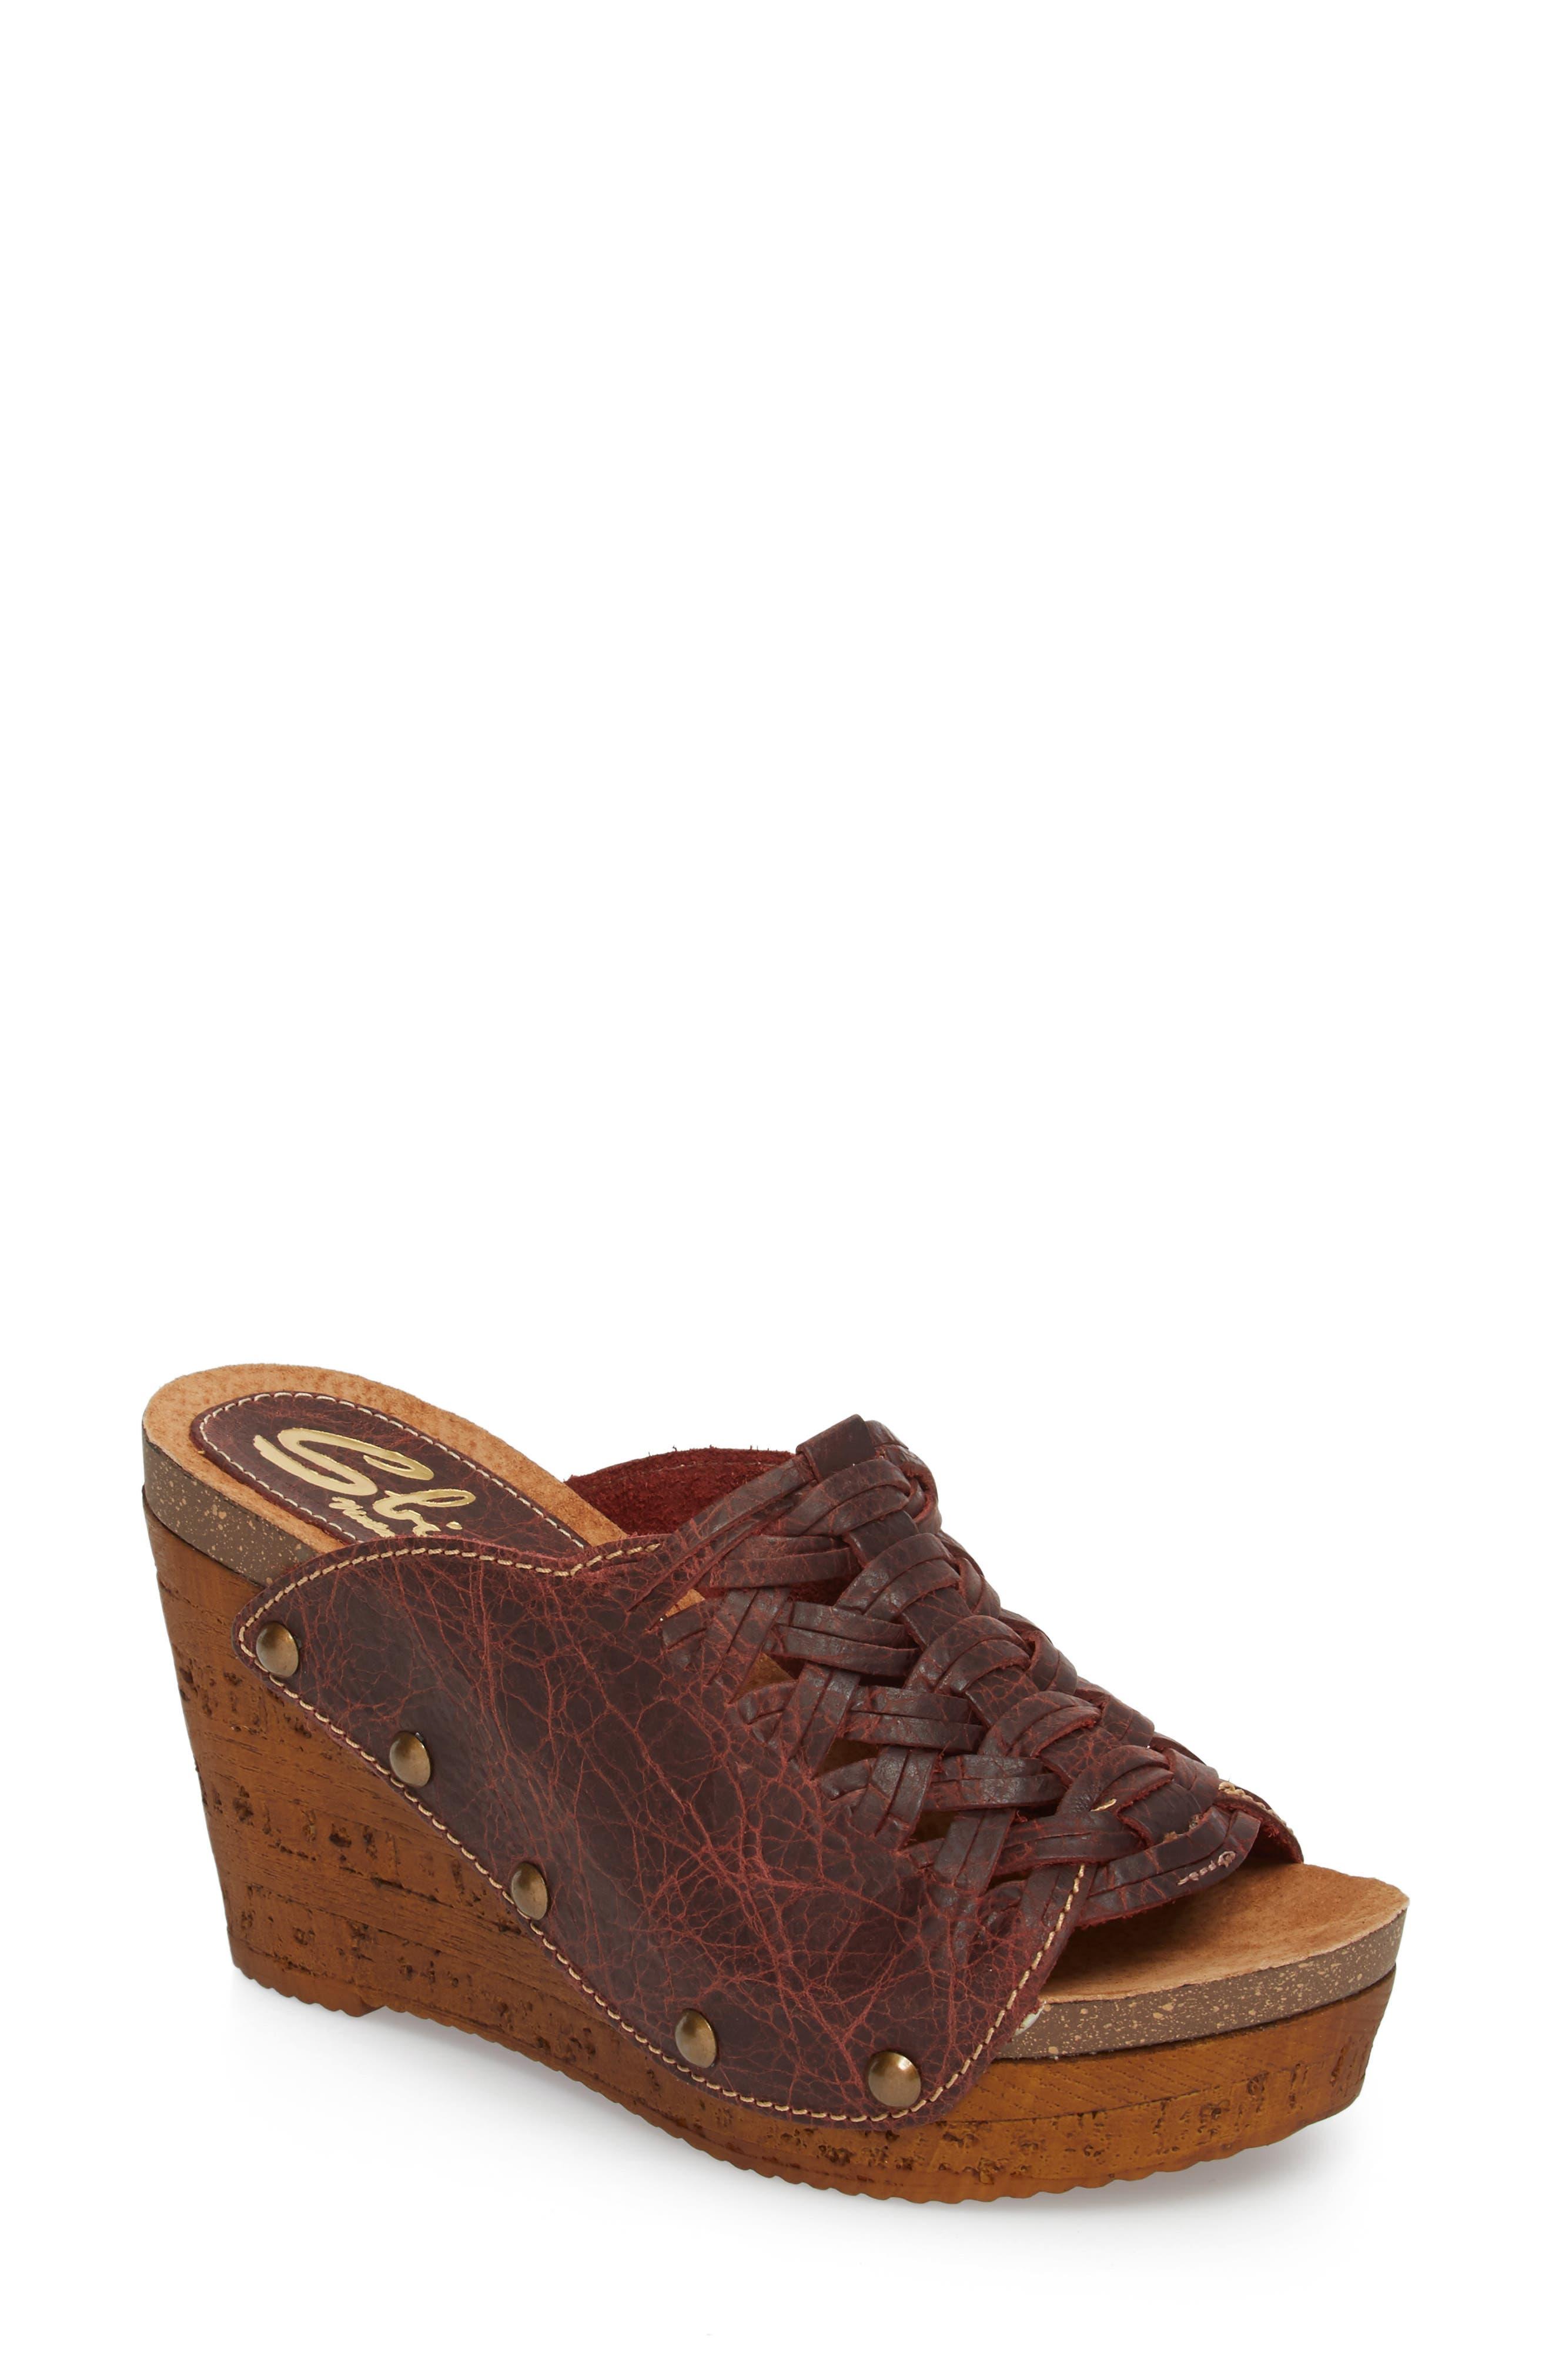 Genesis Platform Wedge Sandal,                         Main,                         color, WINE